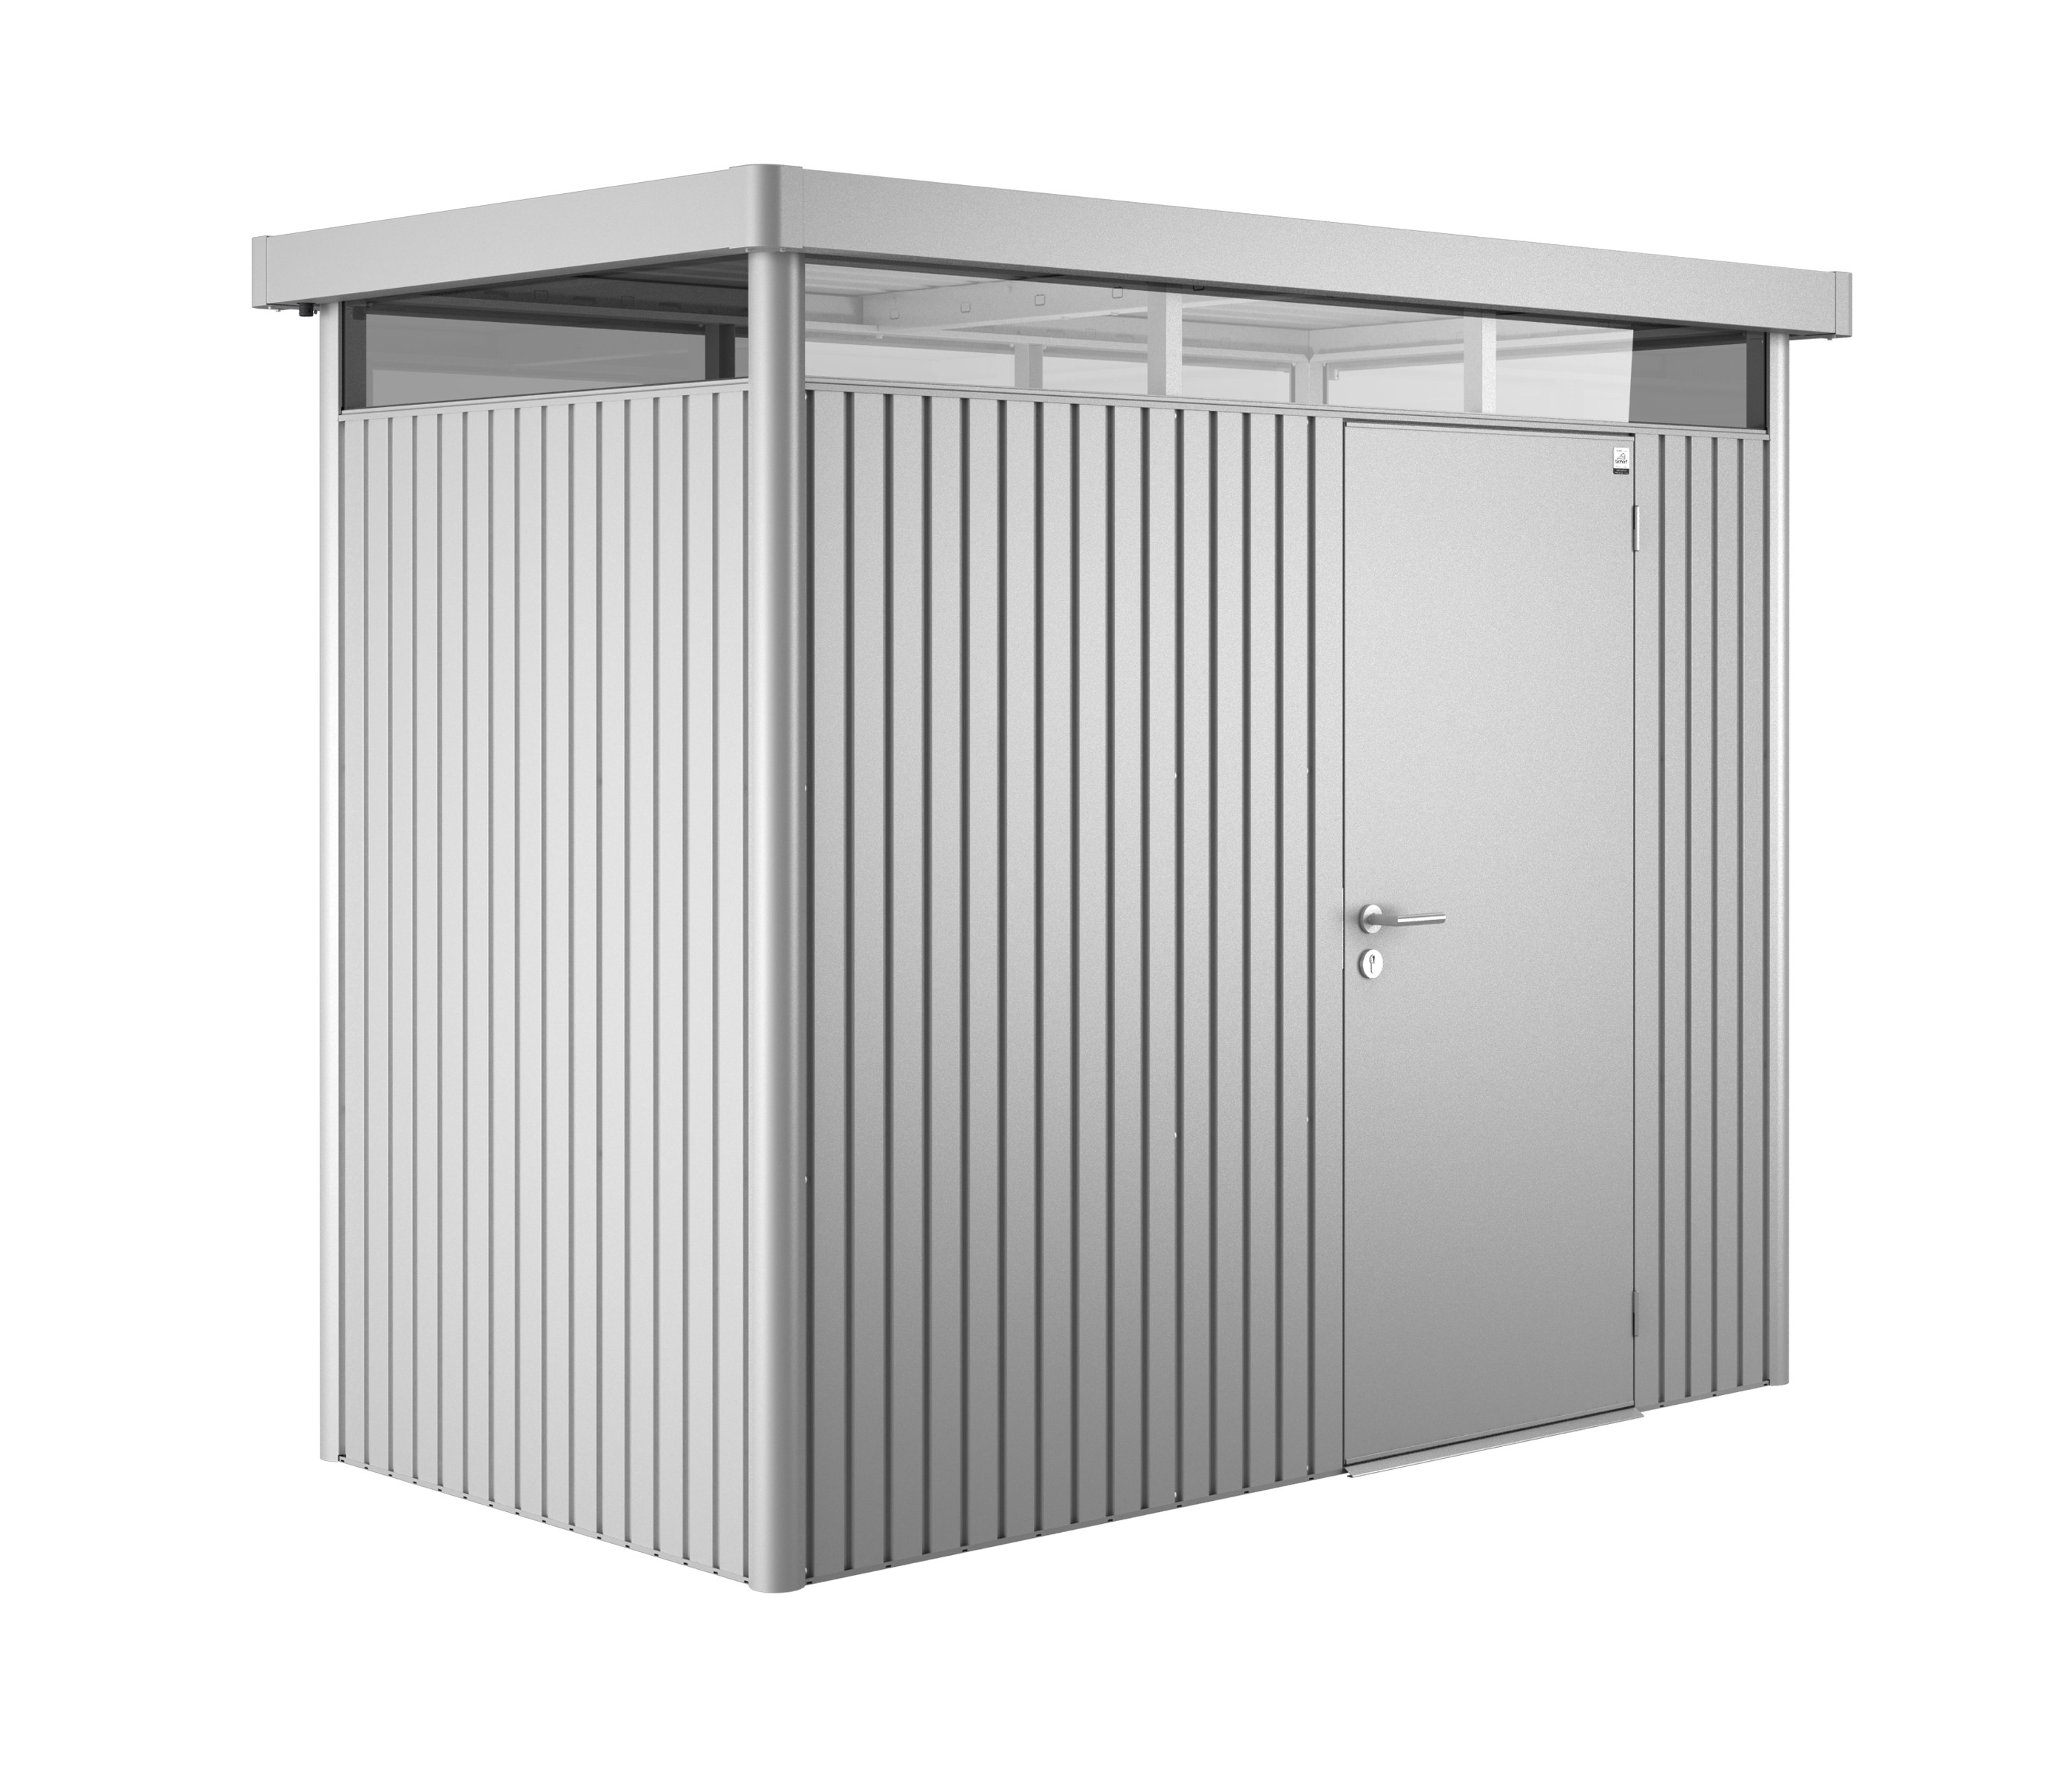 Gerätehaus Biohort HighLine H1 silber-metallic 275x155cm Bild 1